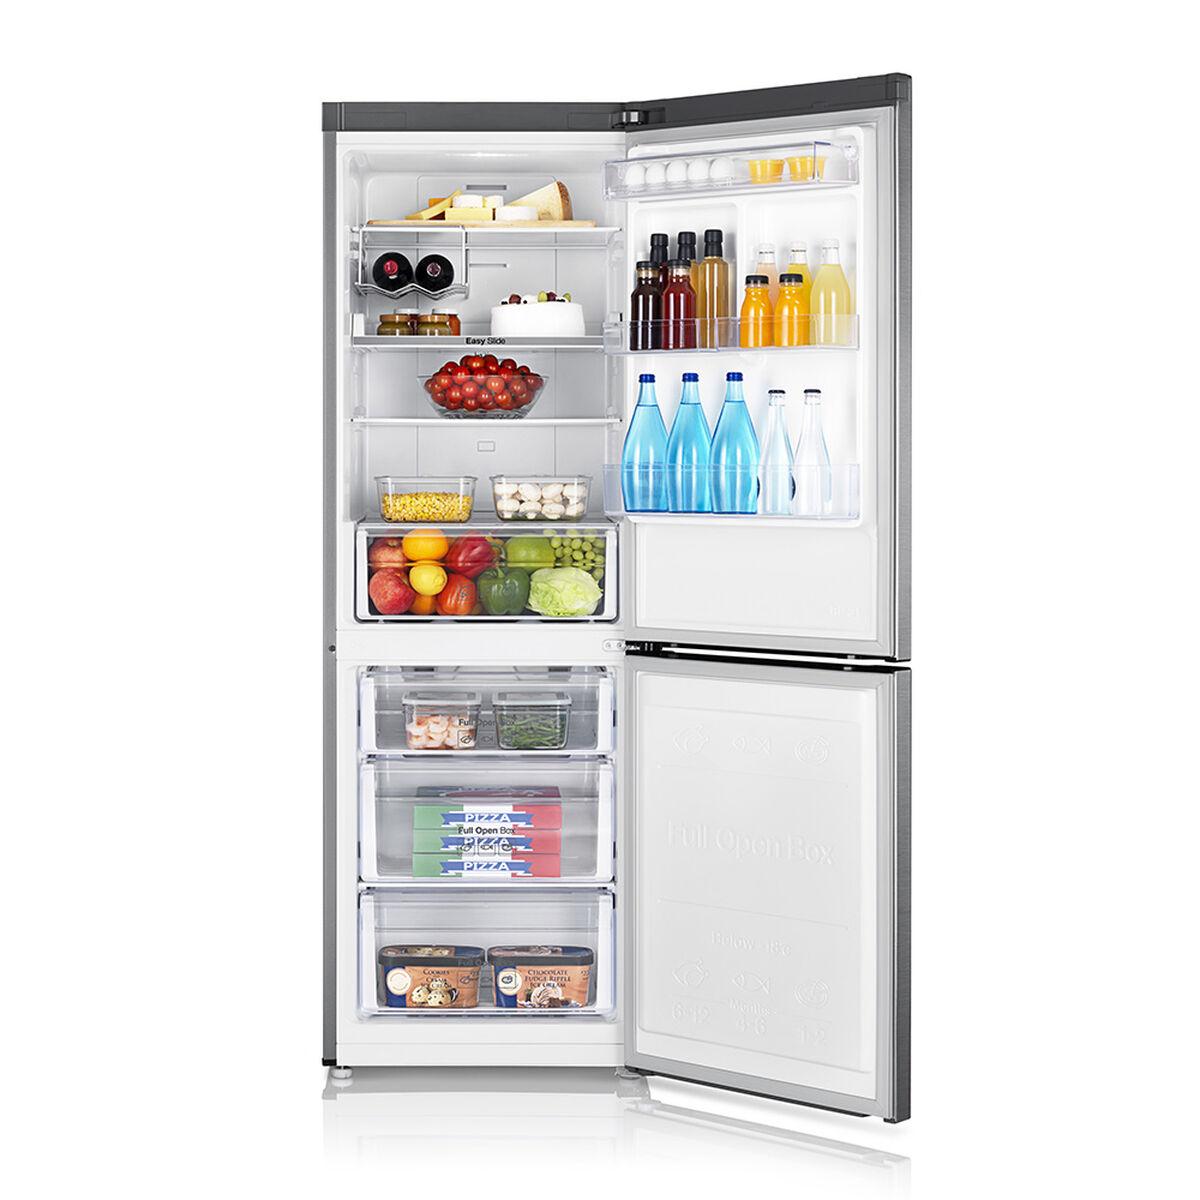 Refrigerador No Frost Samsung RB31K3210S9/ZS 311 lts.